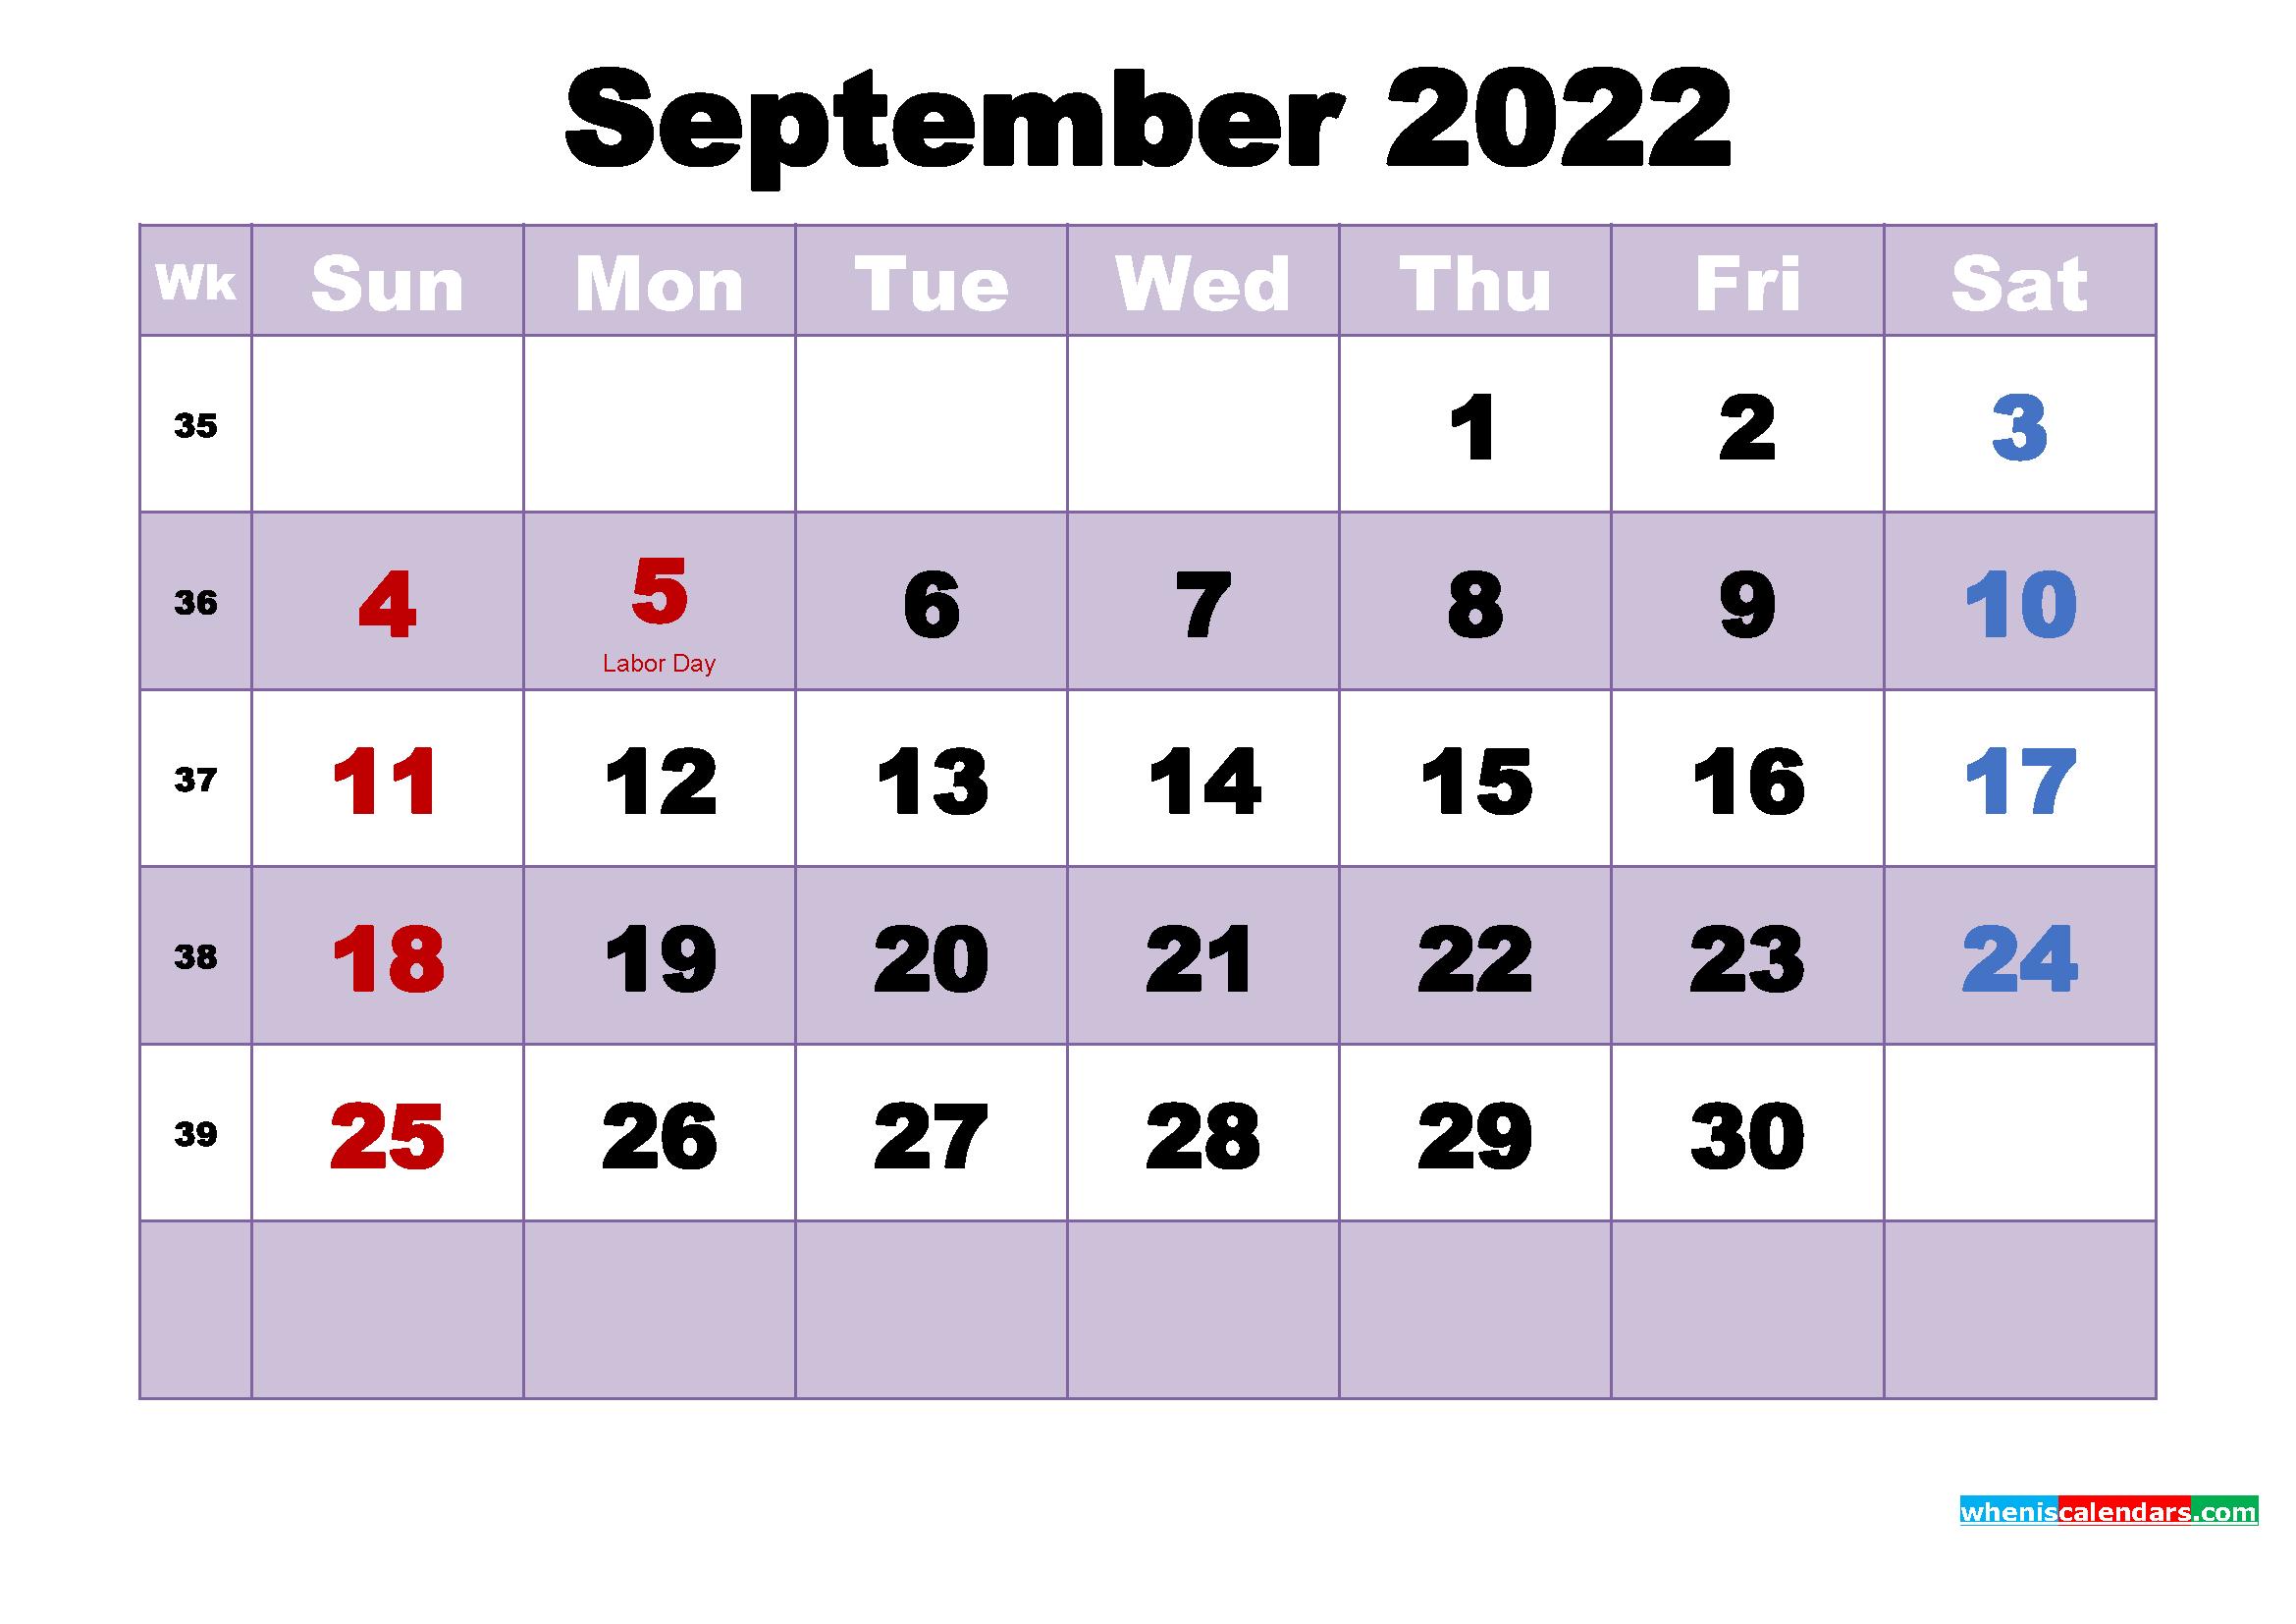 September 2022 Calendar Wallpaper Free Download